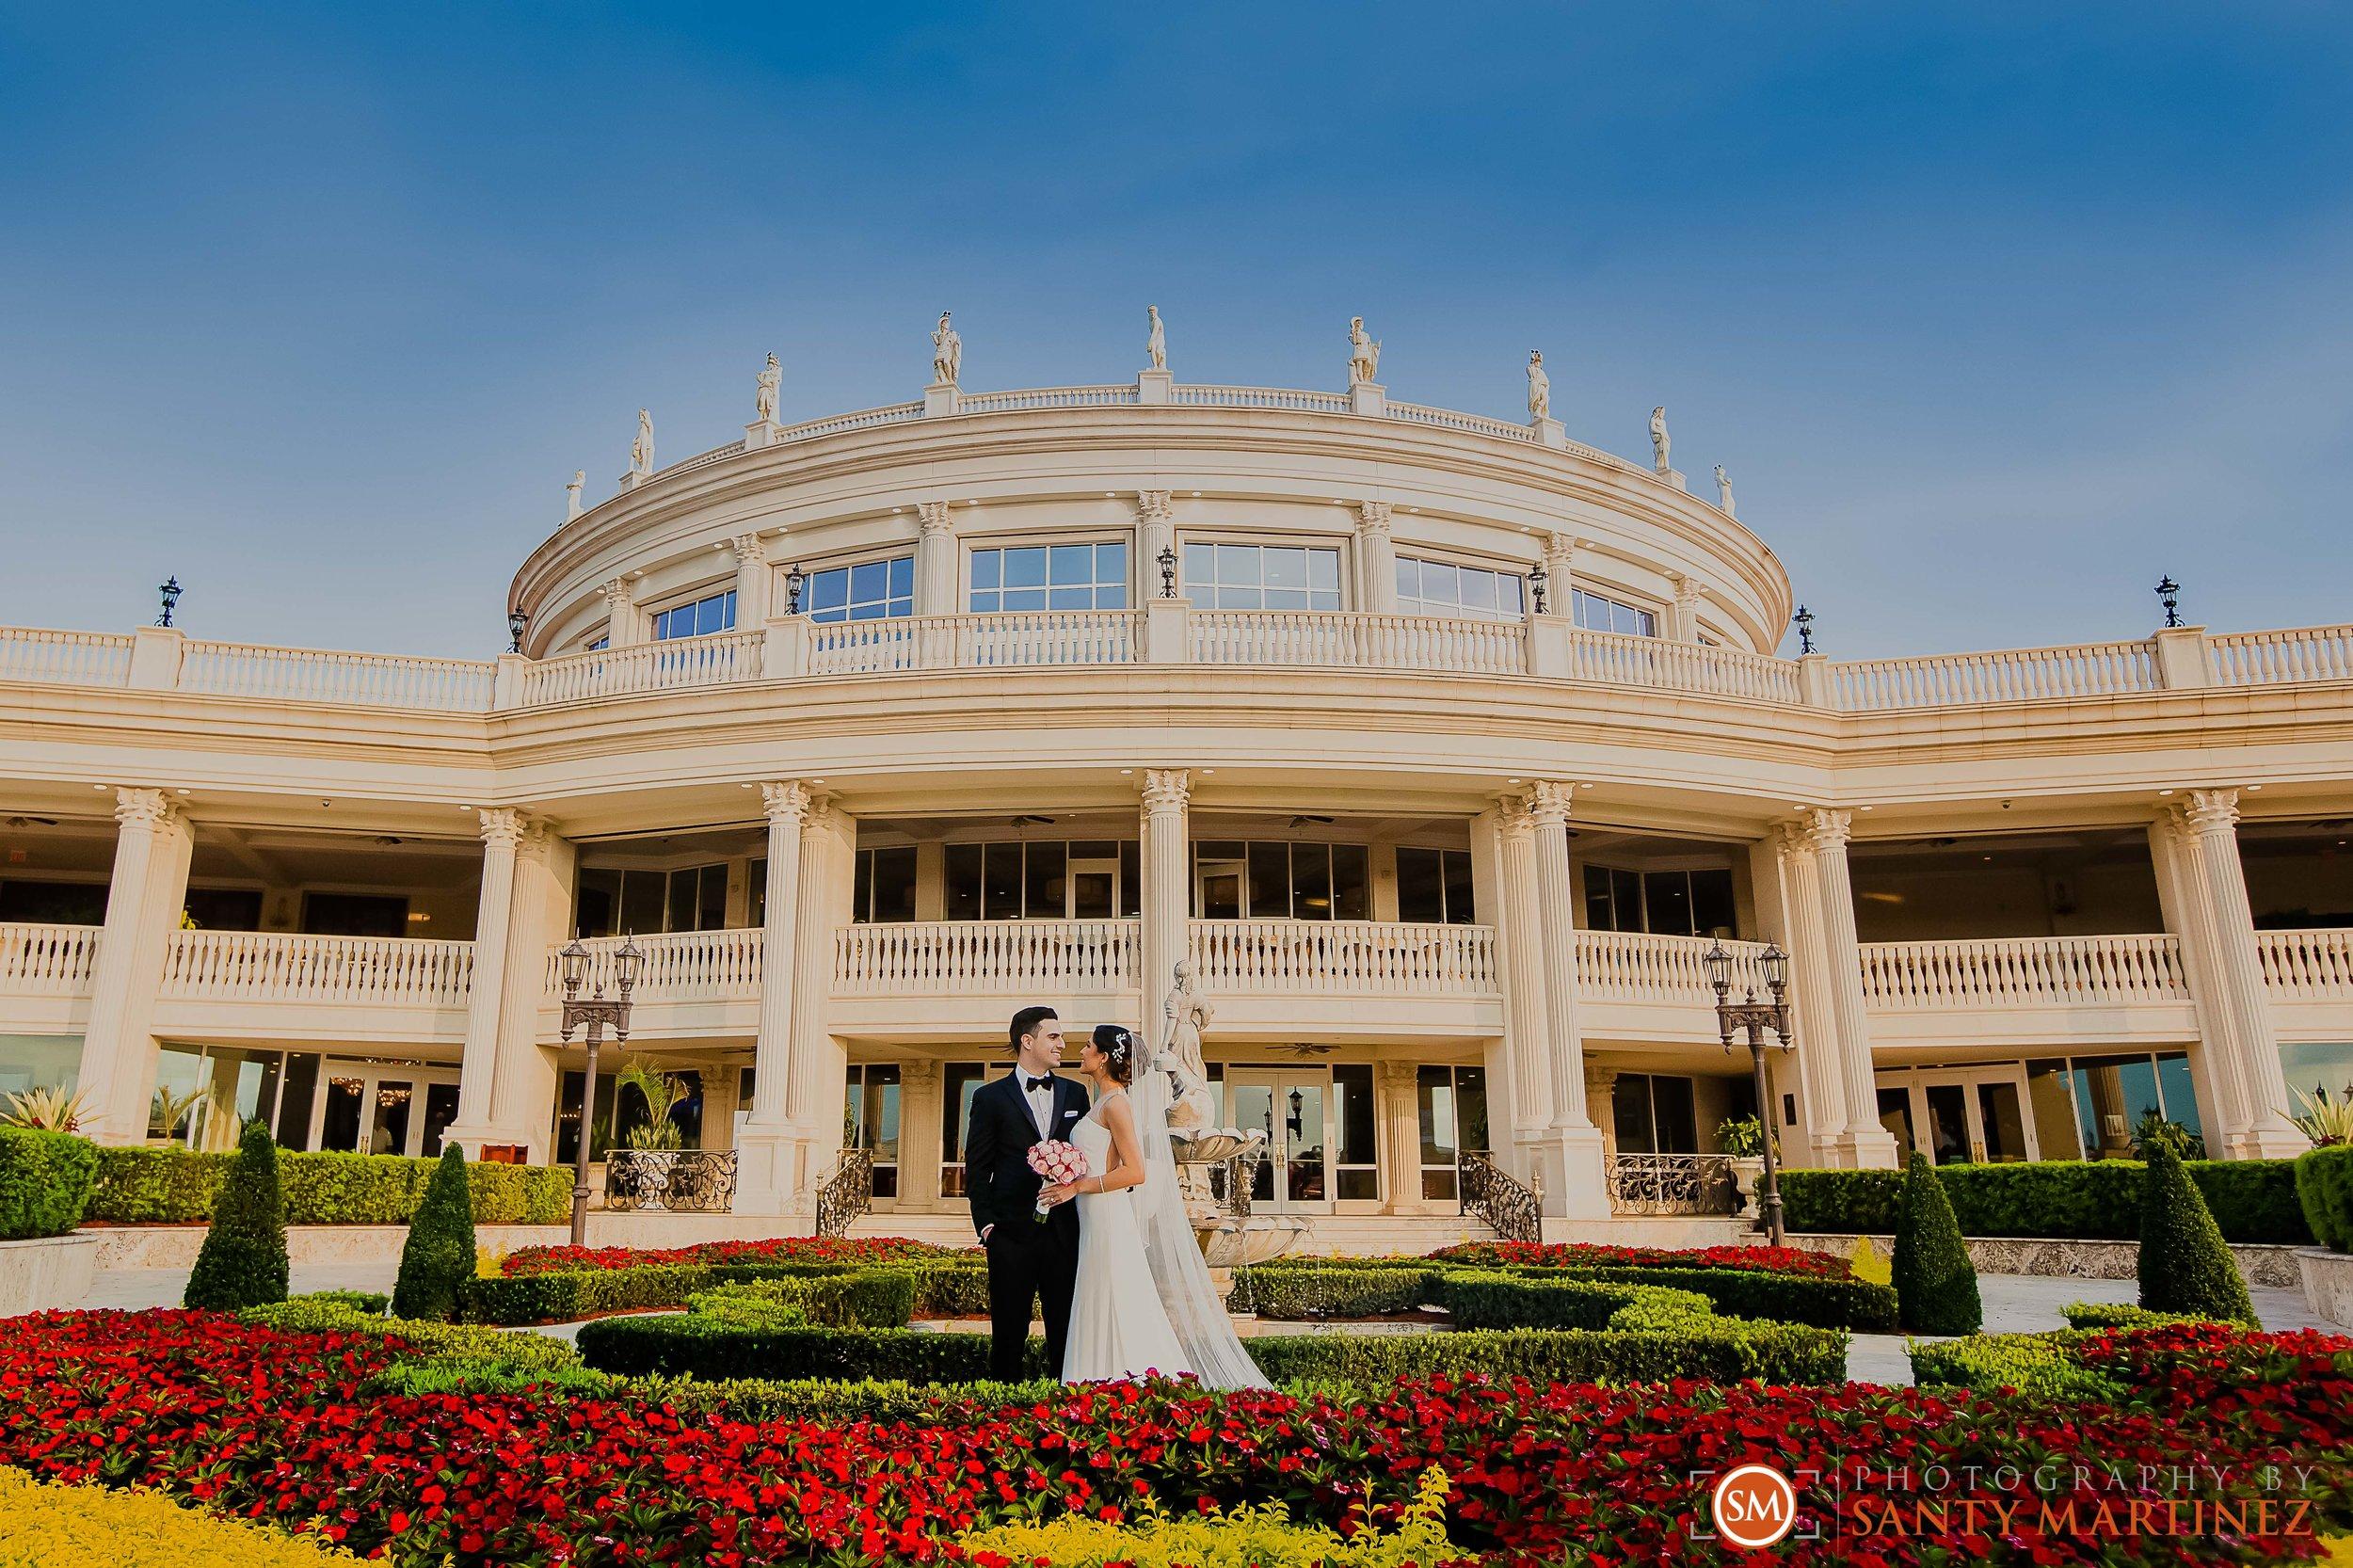 Wedding Trump National Doral Miami - Santy Martinez Photography.jpg